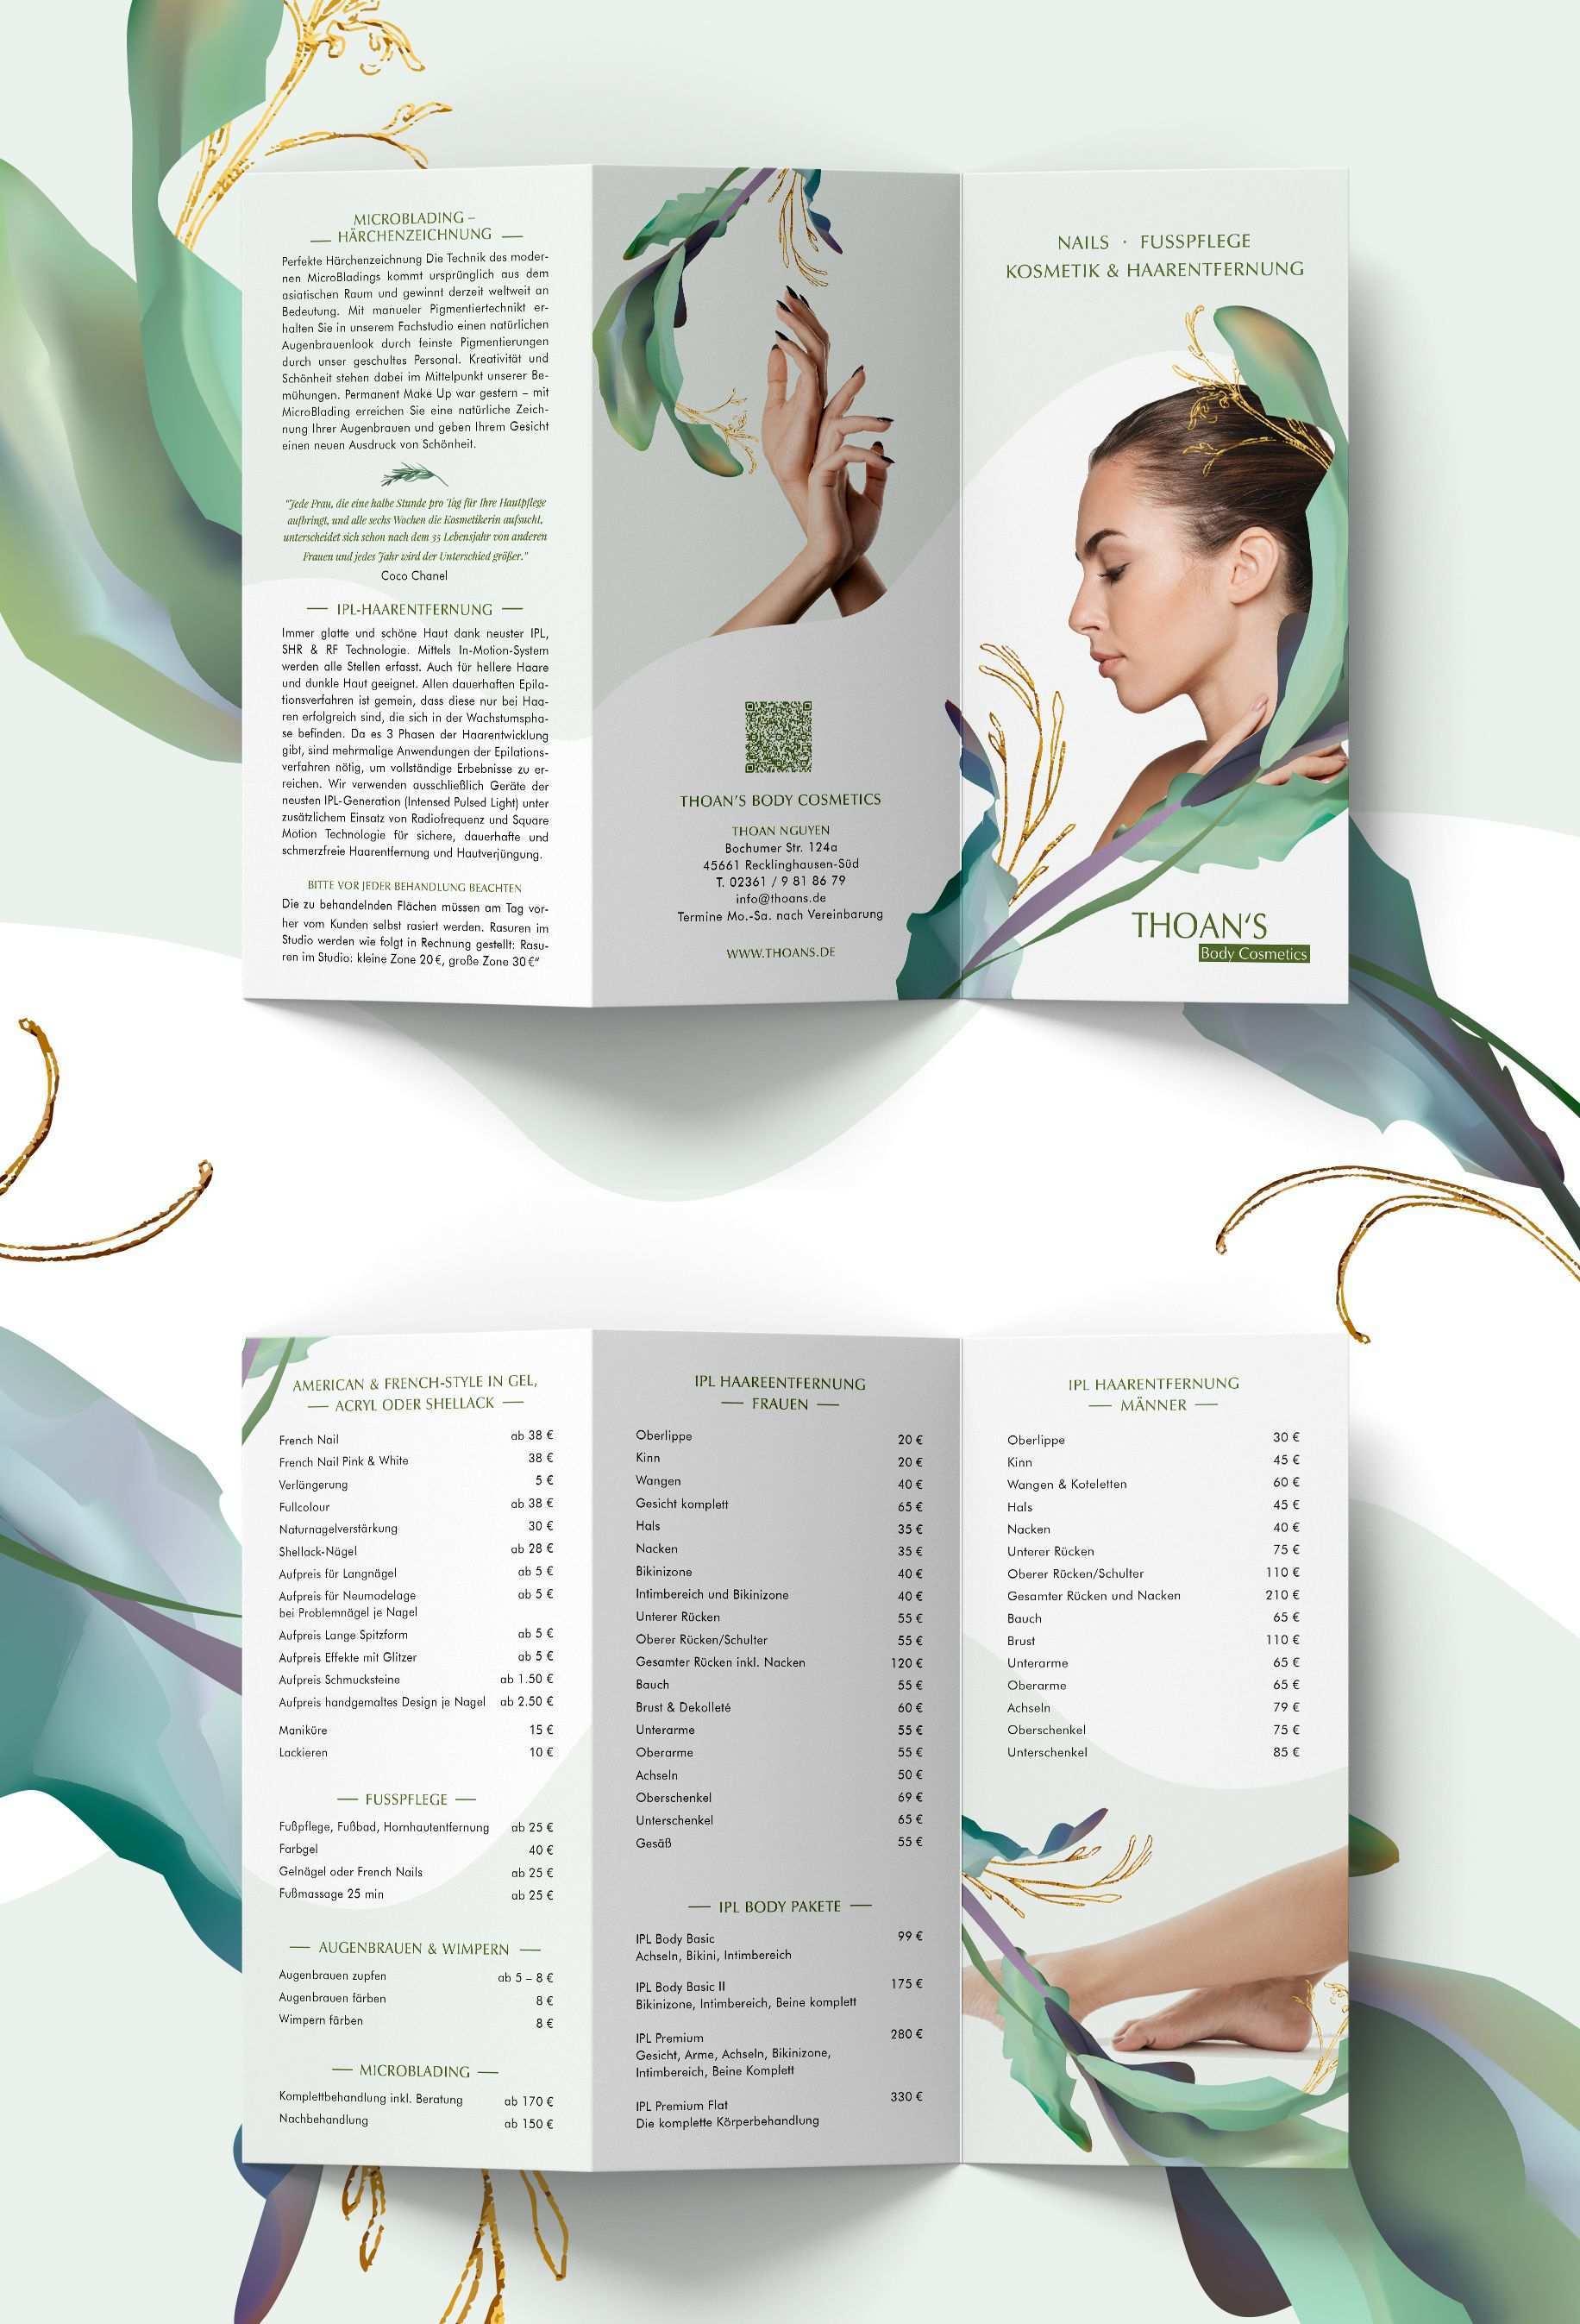 Creative Flyer Design In 2020 Kosmetikerin Kosmetik Oberlippe